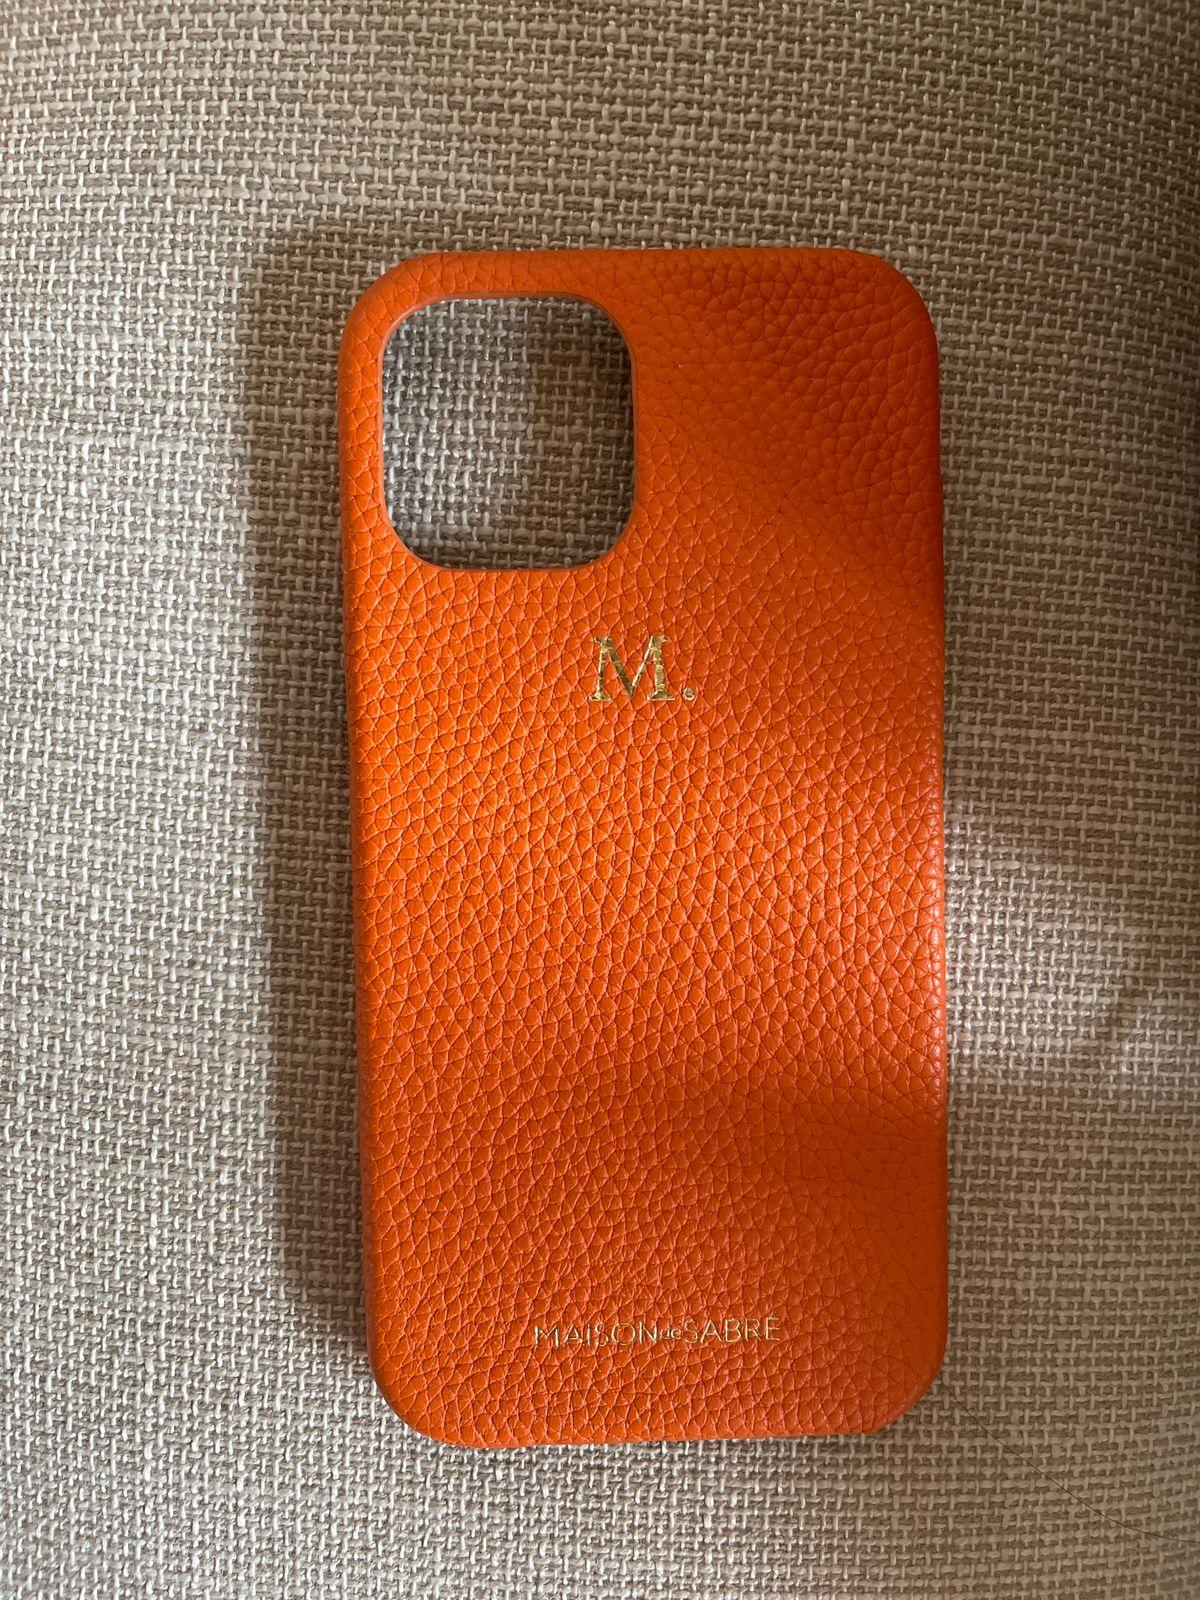 The Phone Case: Customized phone cover | MAISON de SABRE